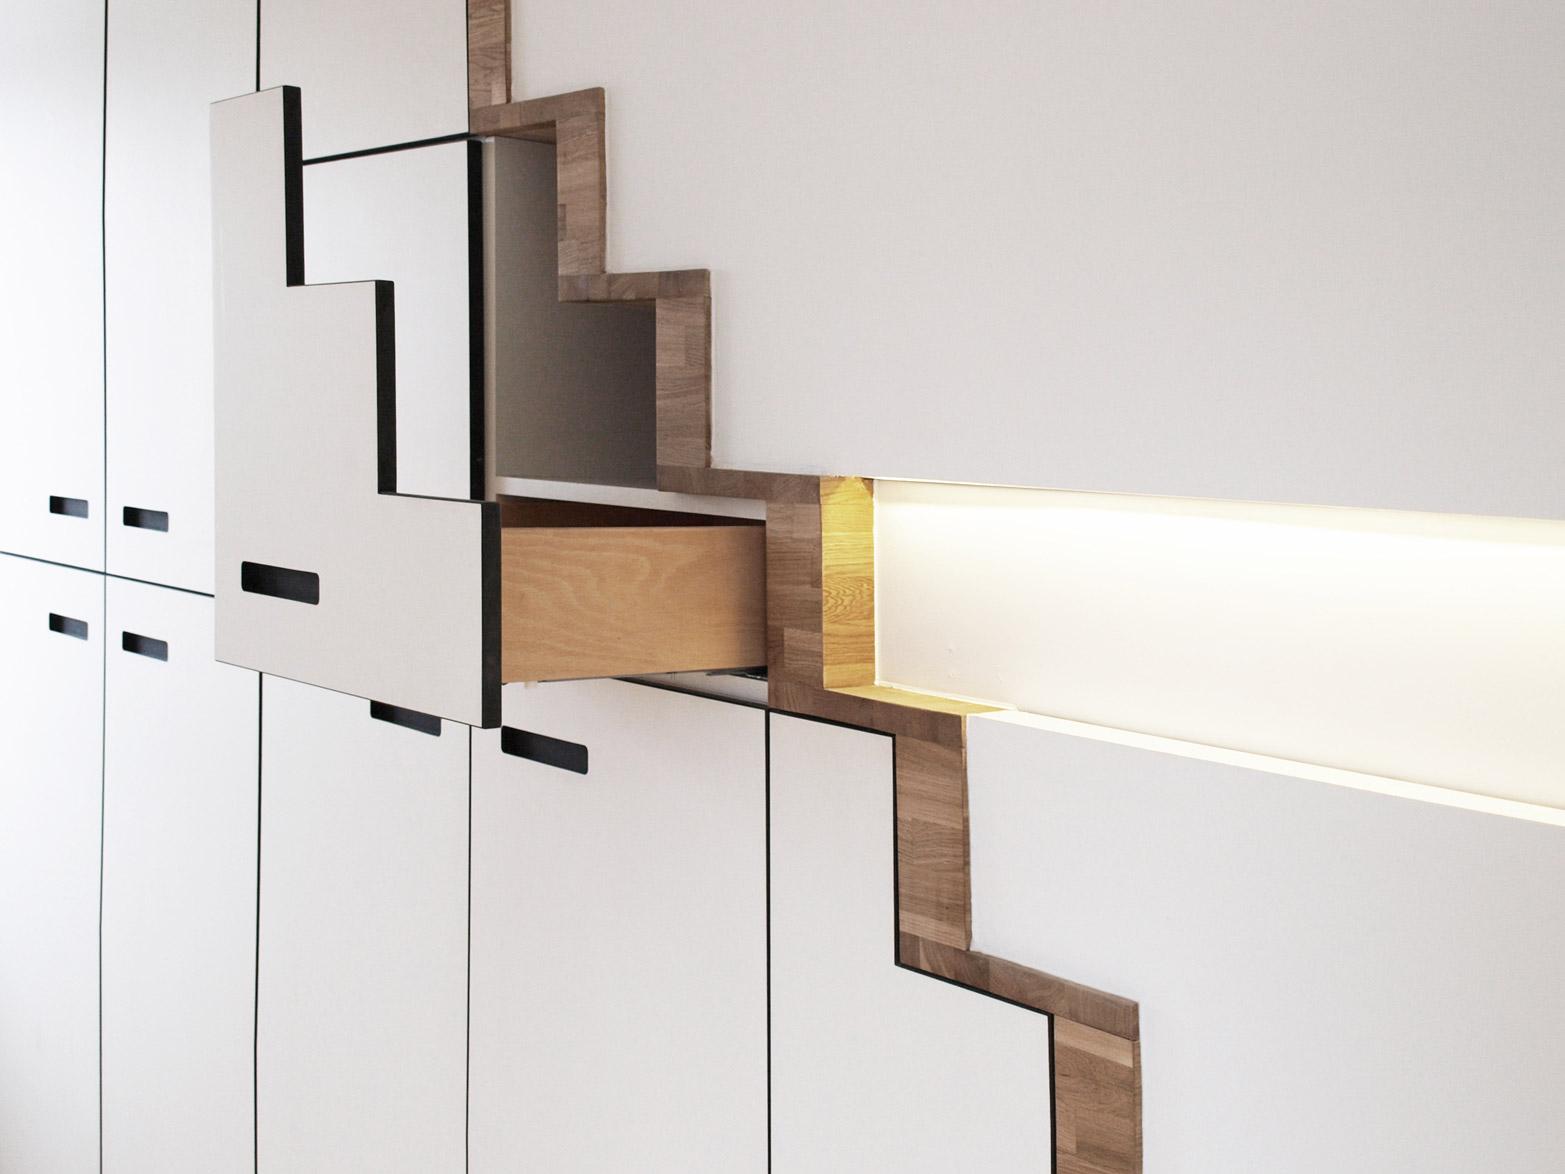 umbau wohnhaus in rahlstedt architektur m bel cattau. Black Bedroom Furniture Sets. Home Design Ideas